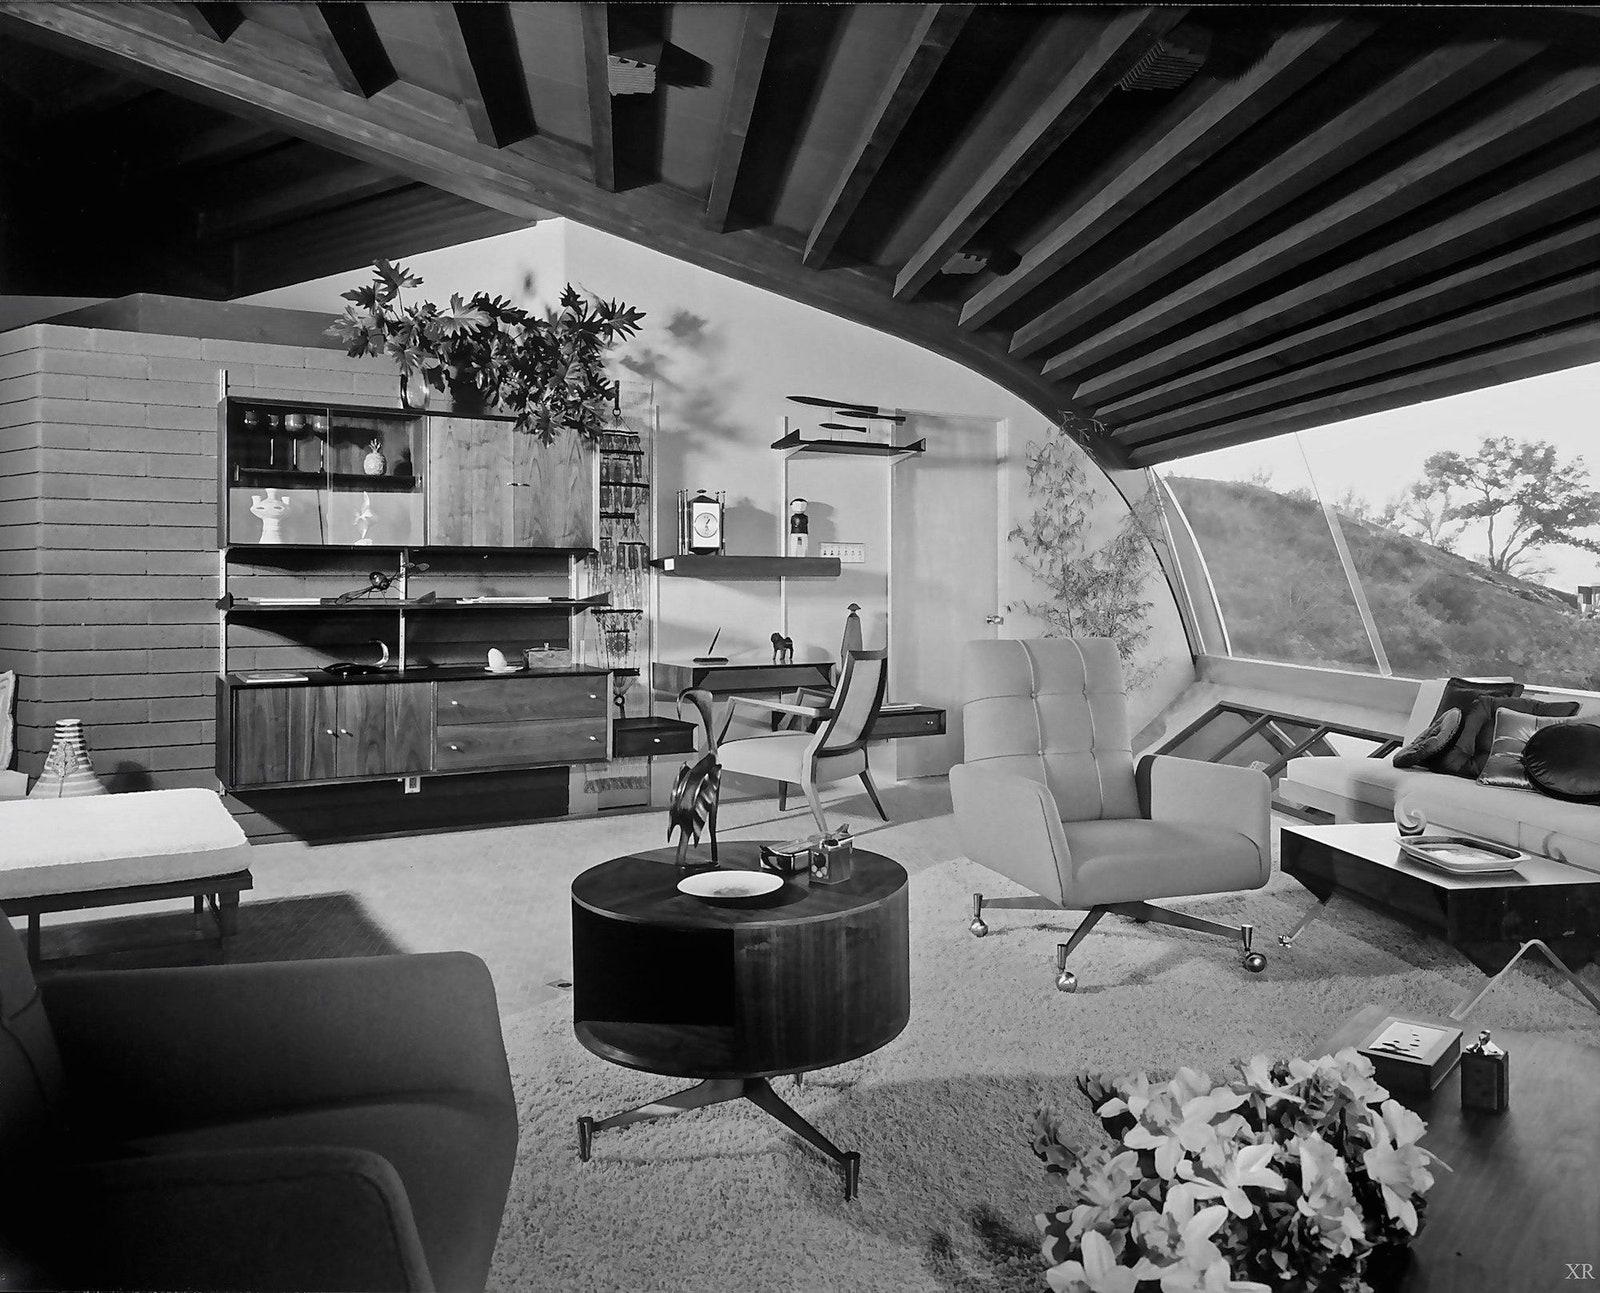 The Chemosphere Residence by Julius Shulman Gallery